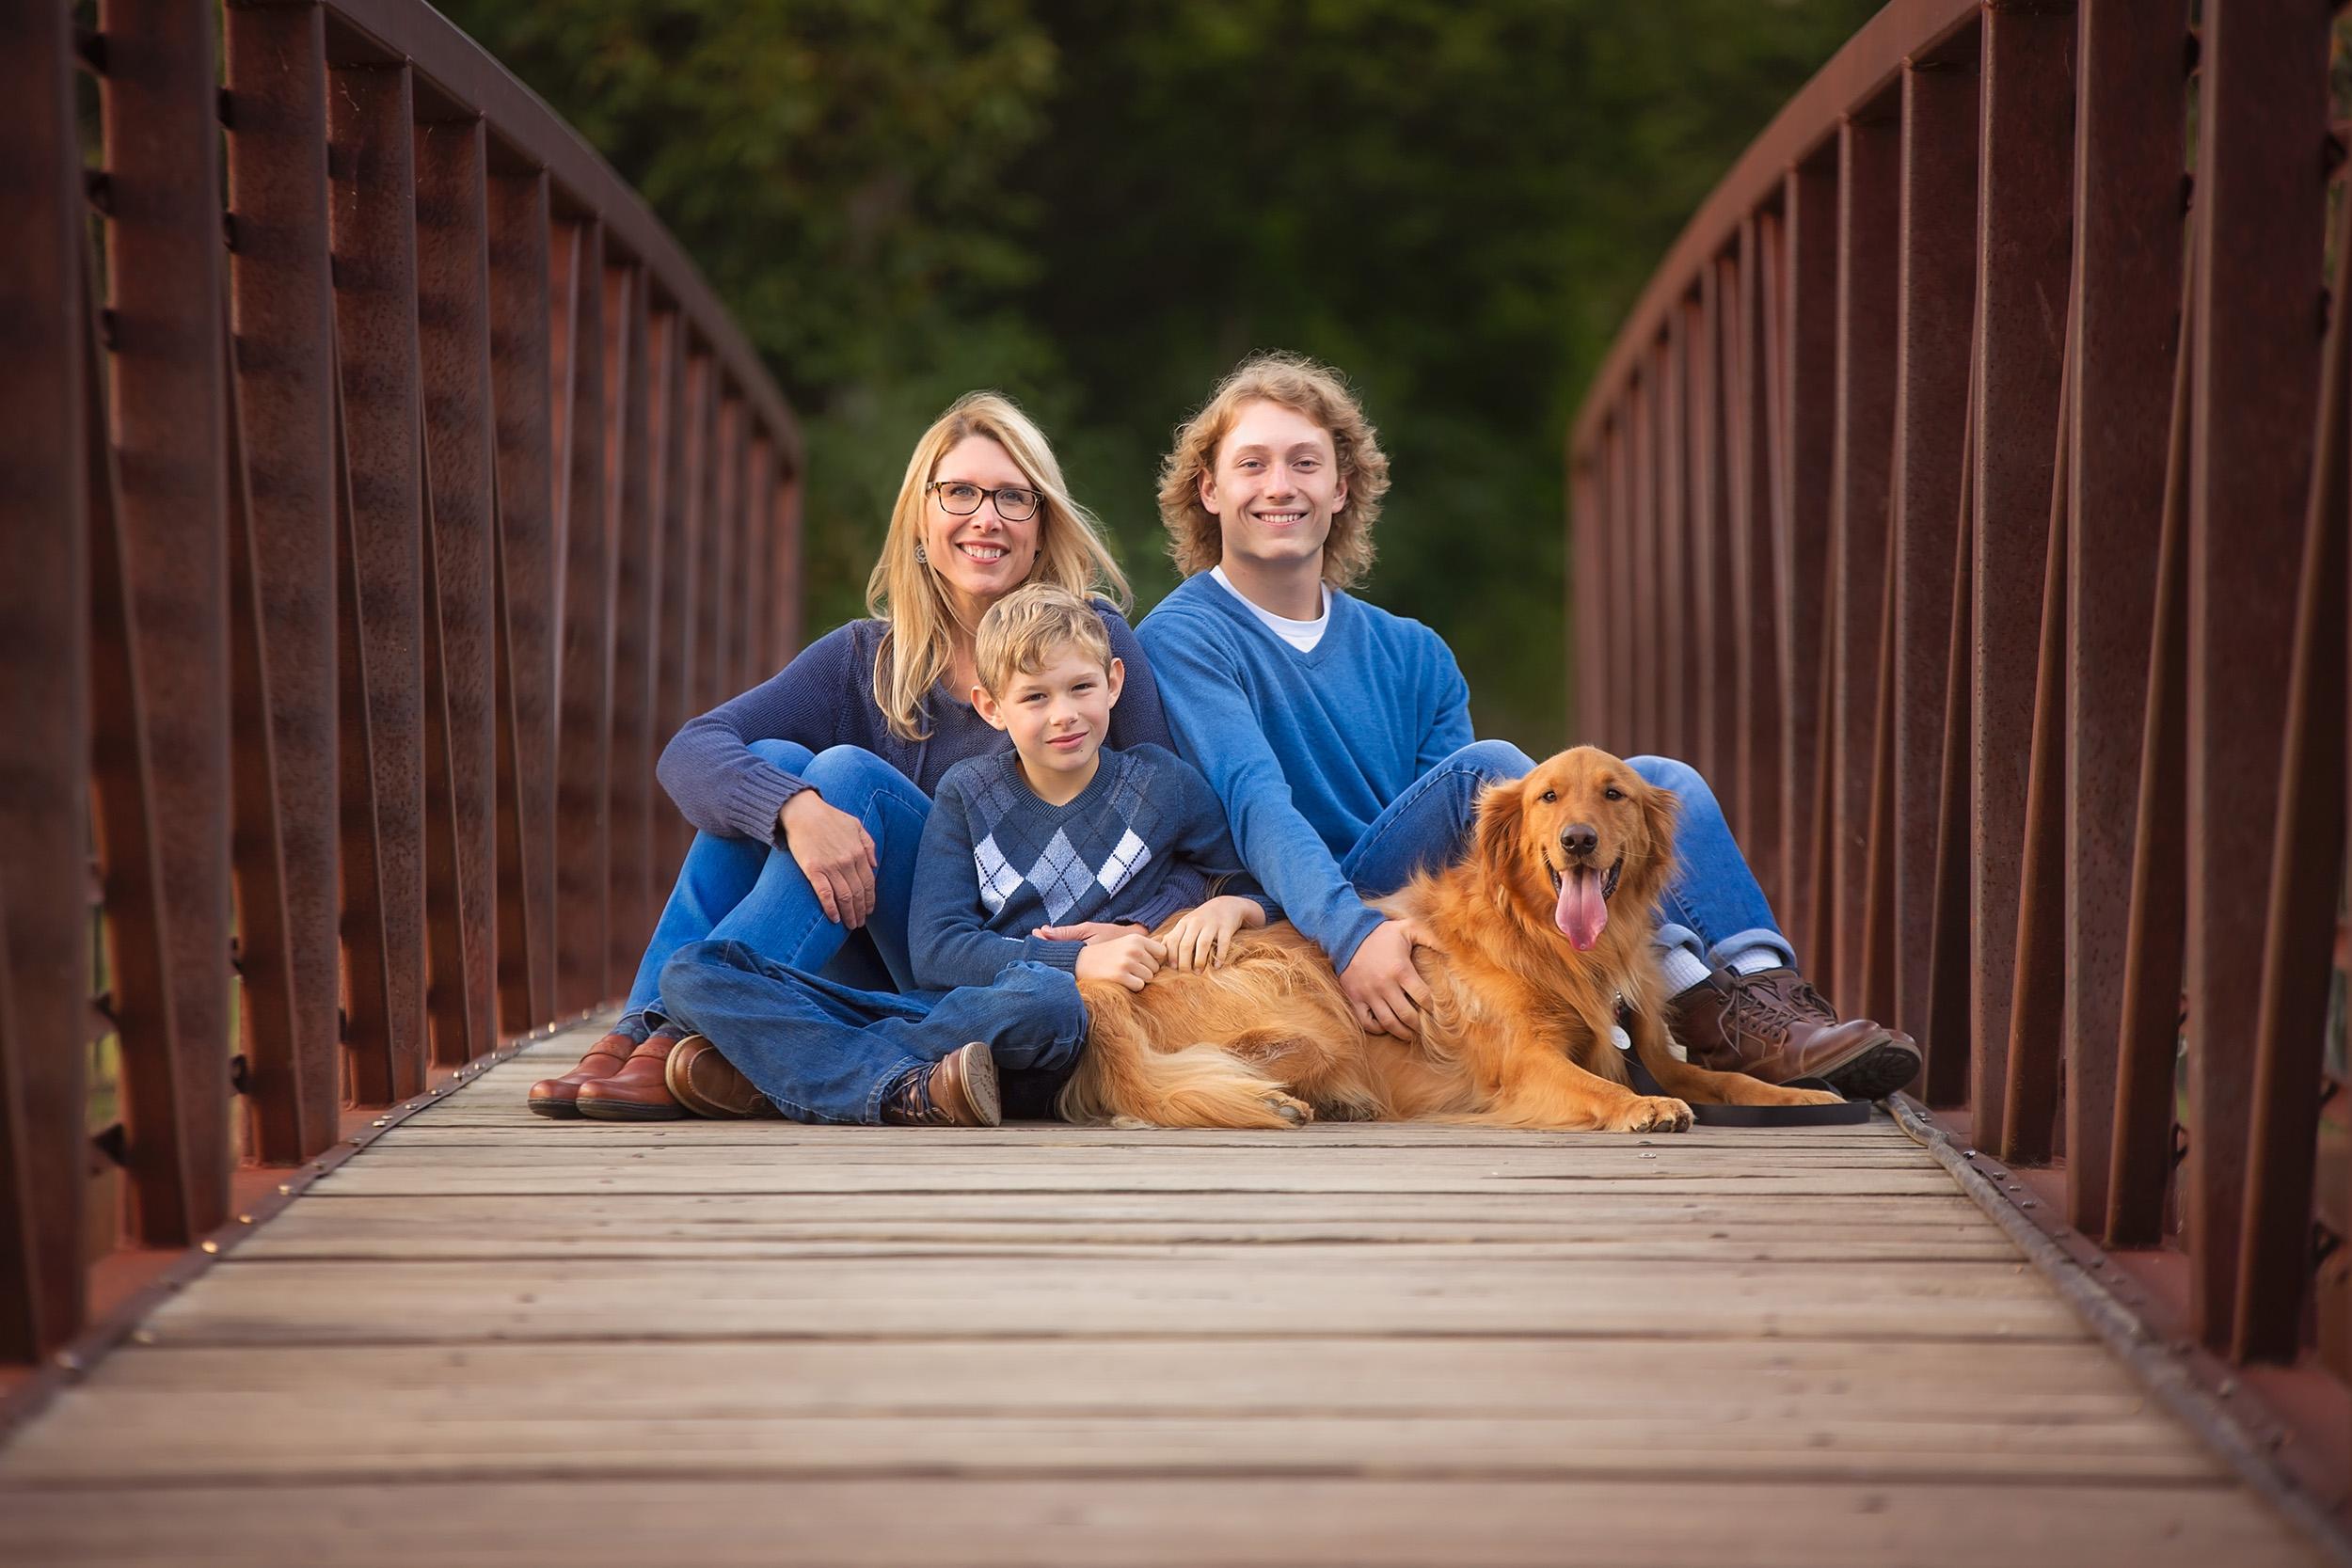 Family Photographer Springfield, Missouri